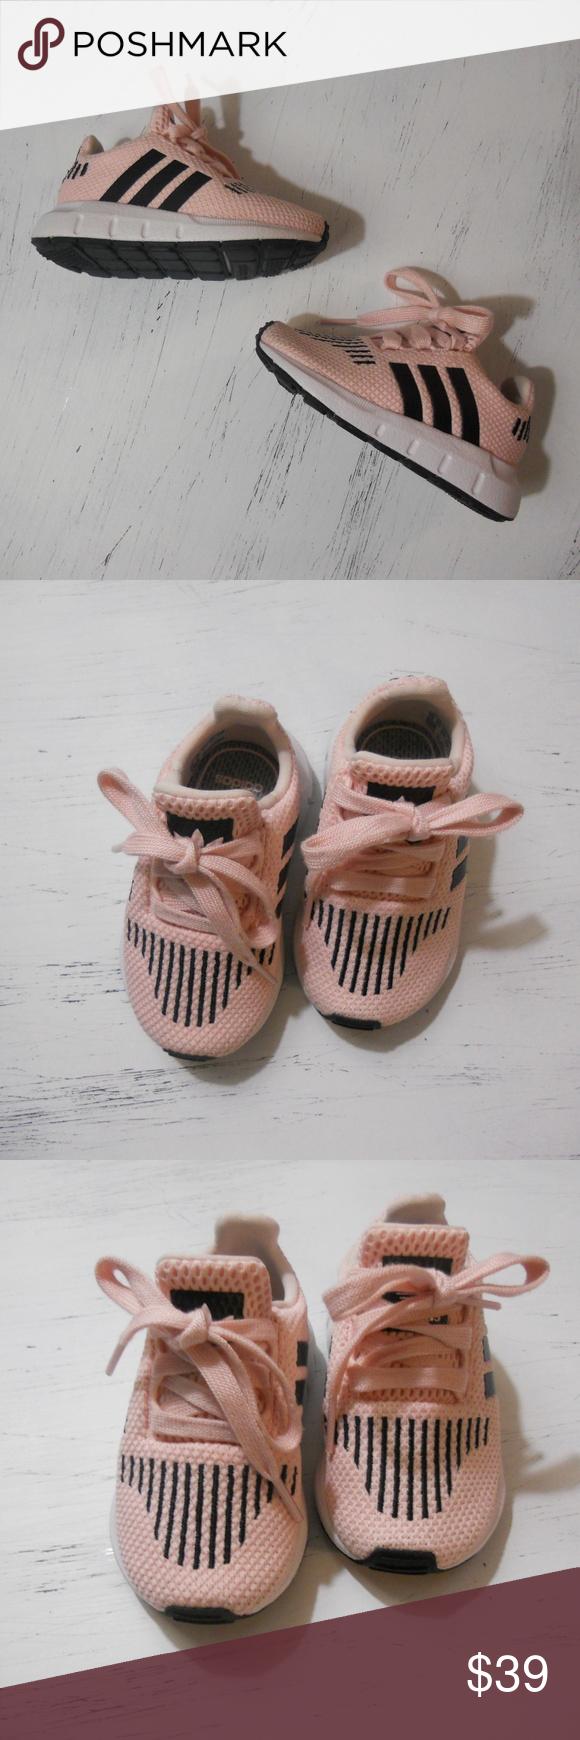 5094b5dc6e416 Adidas size 5 ortholite swift run SOO CUTE! Baby girl Adidas shoes ...